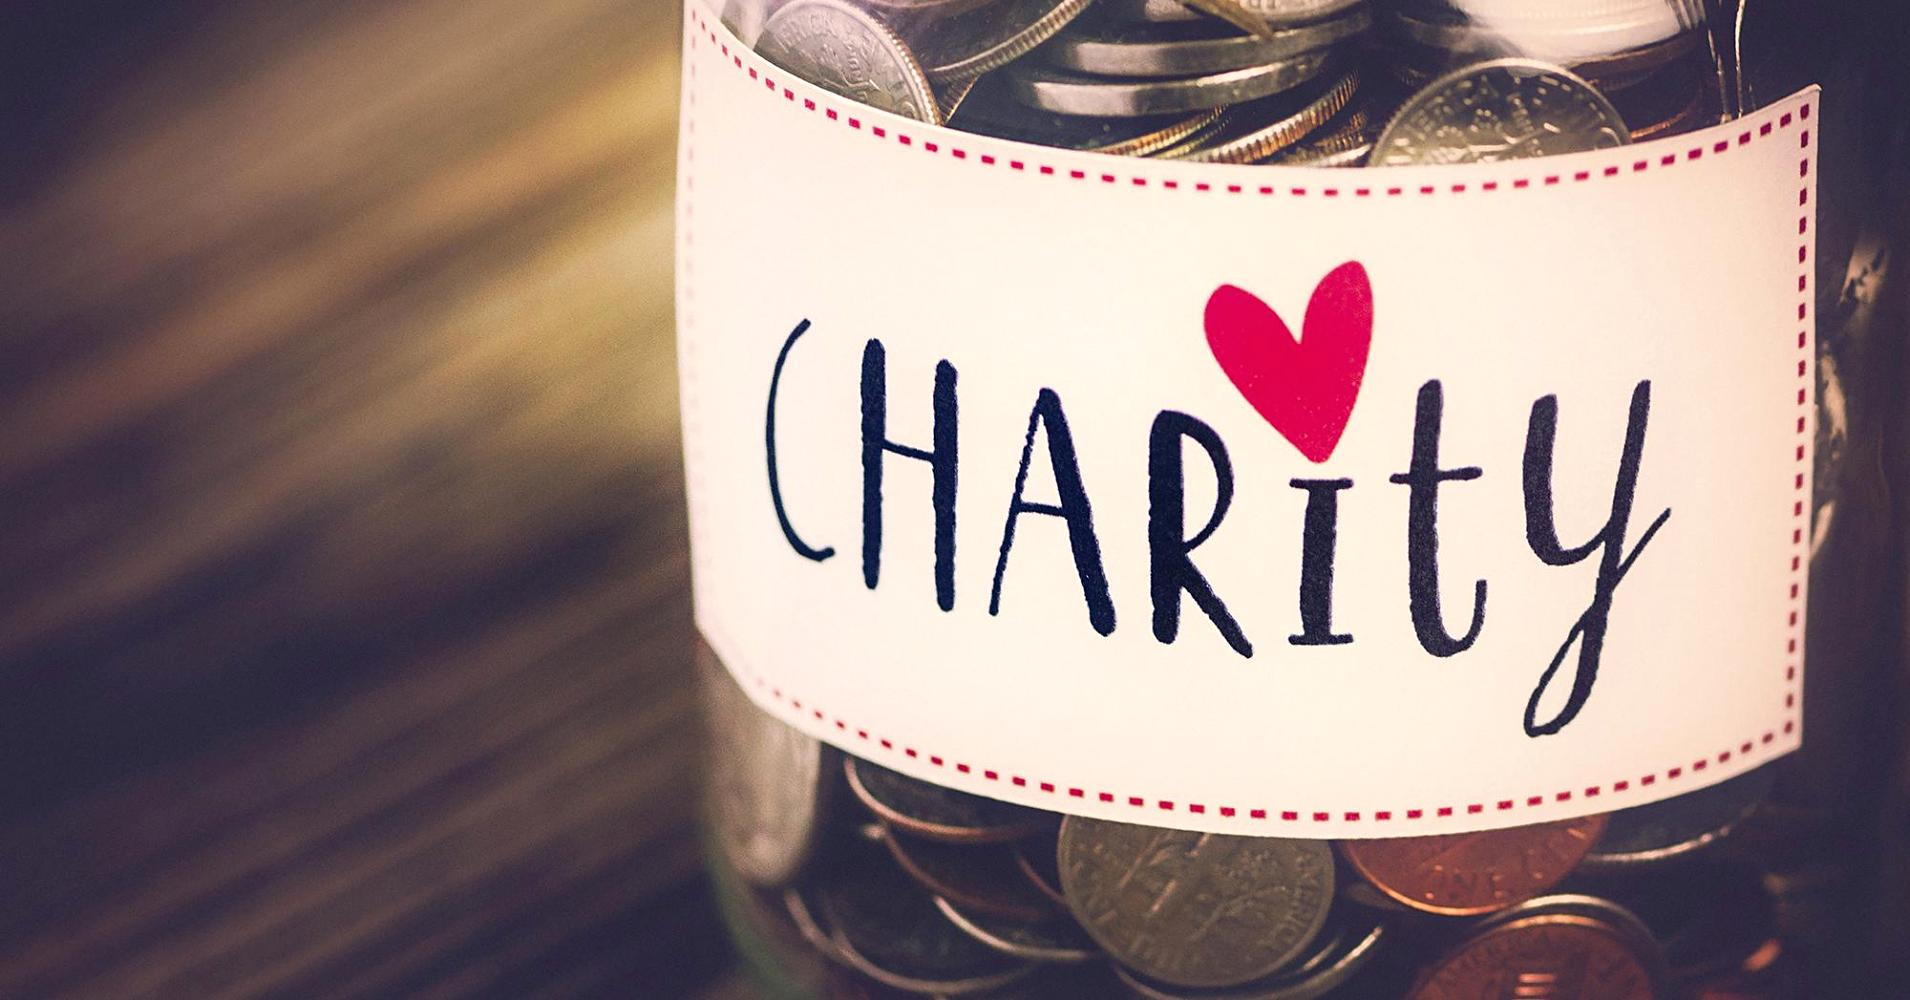 Charity-Jar.jpg